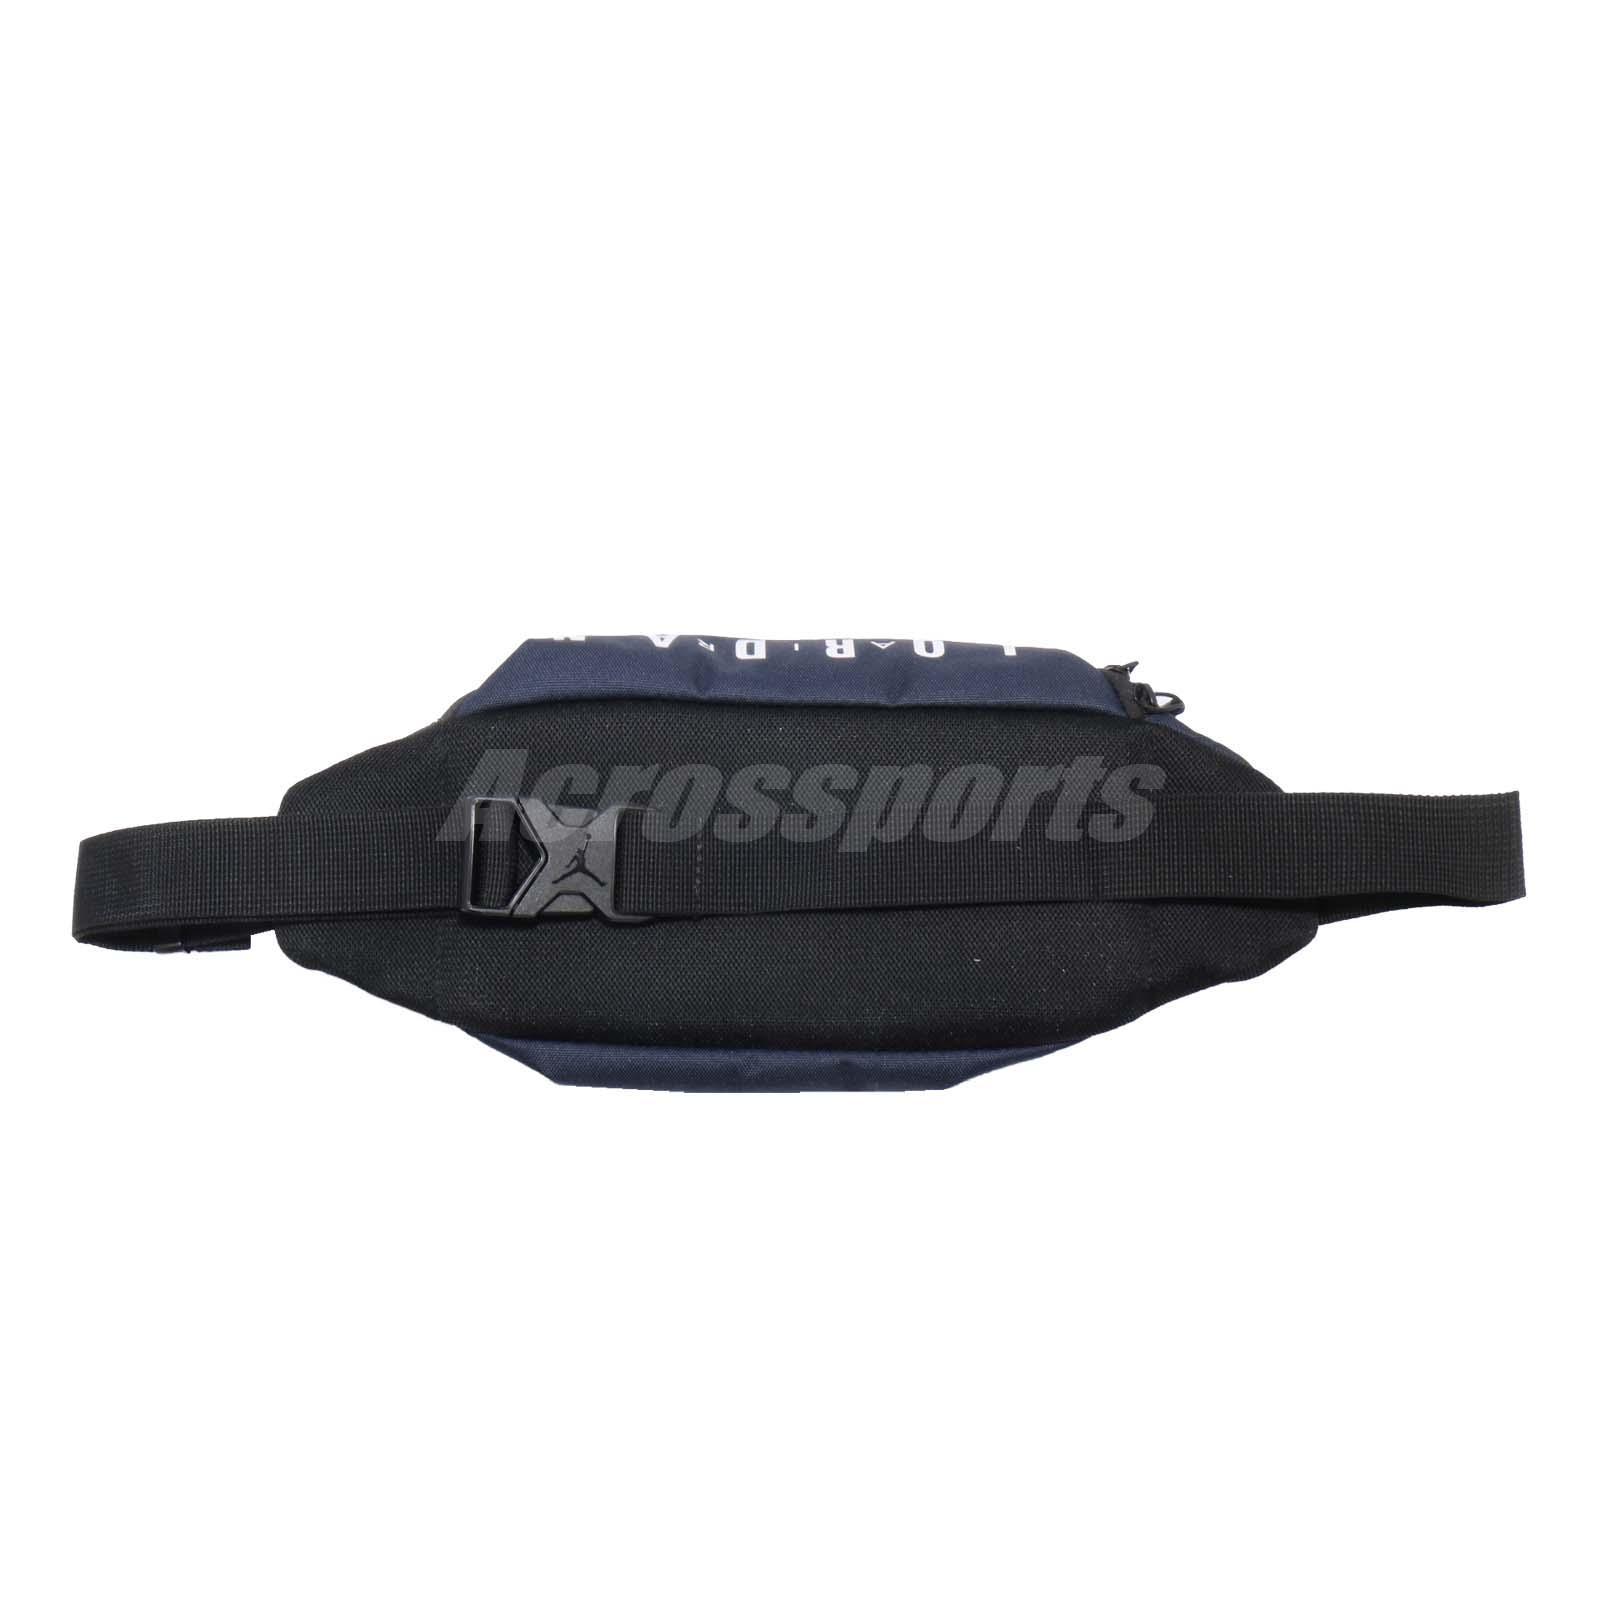 Nike Air Jordan Crossbody Waist Bag Fanny Pack Belt Bum 4L Navy Blue ... f0538cc18dad